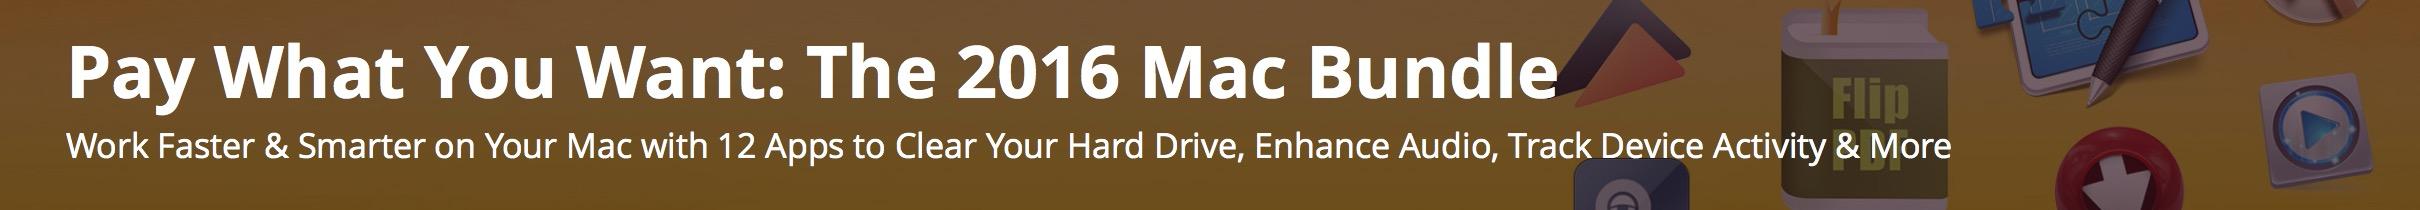 The 2016 Mac Bundle 3